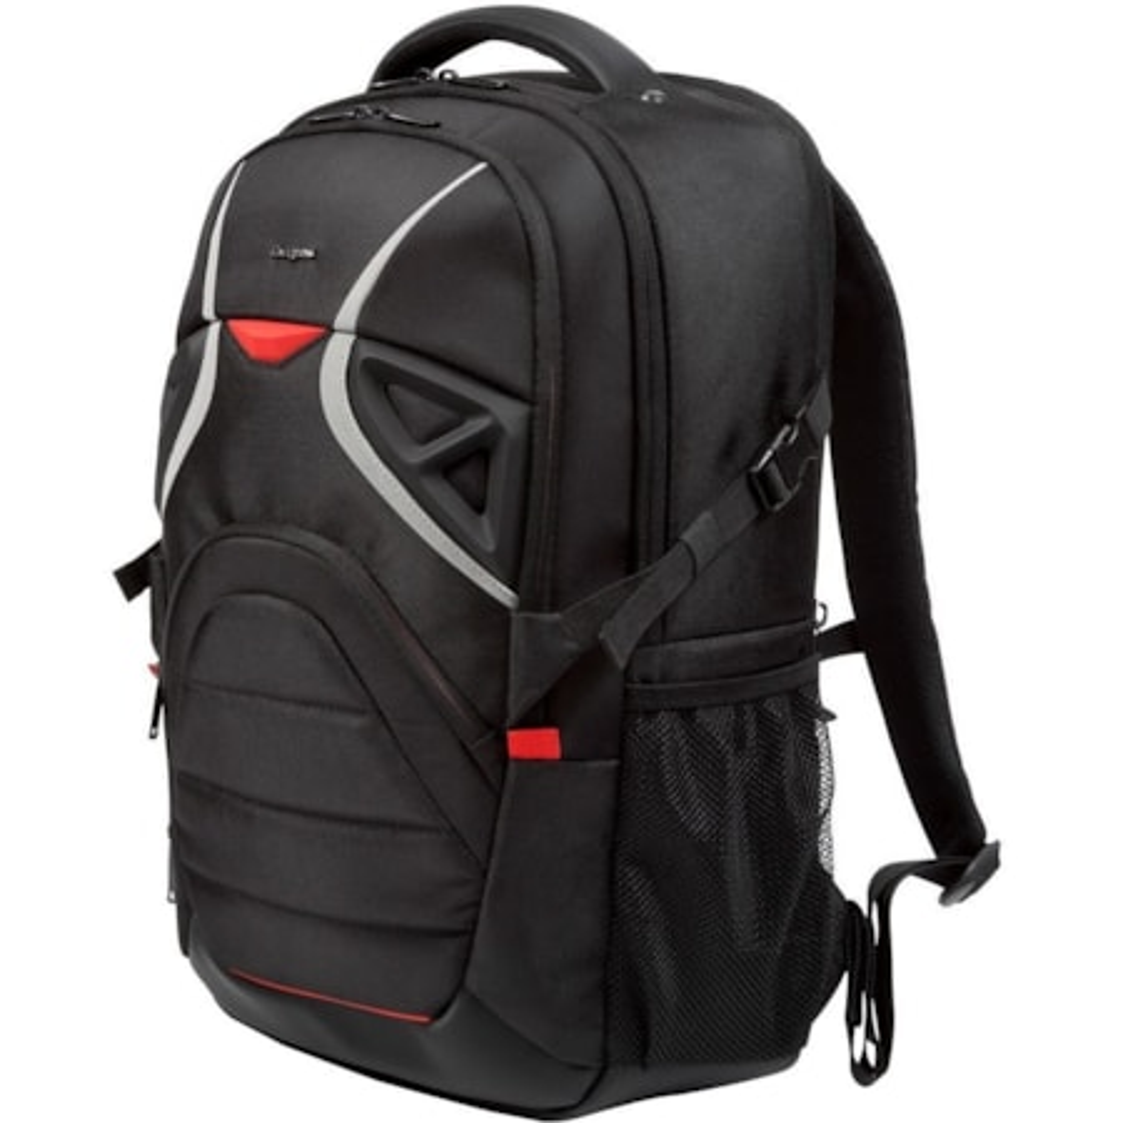 "Targus Strike TSB900AU Carrying Case (Backpack) for 43.9 cm (17.3"") Notebook - Black, Red"